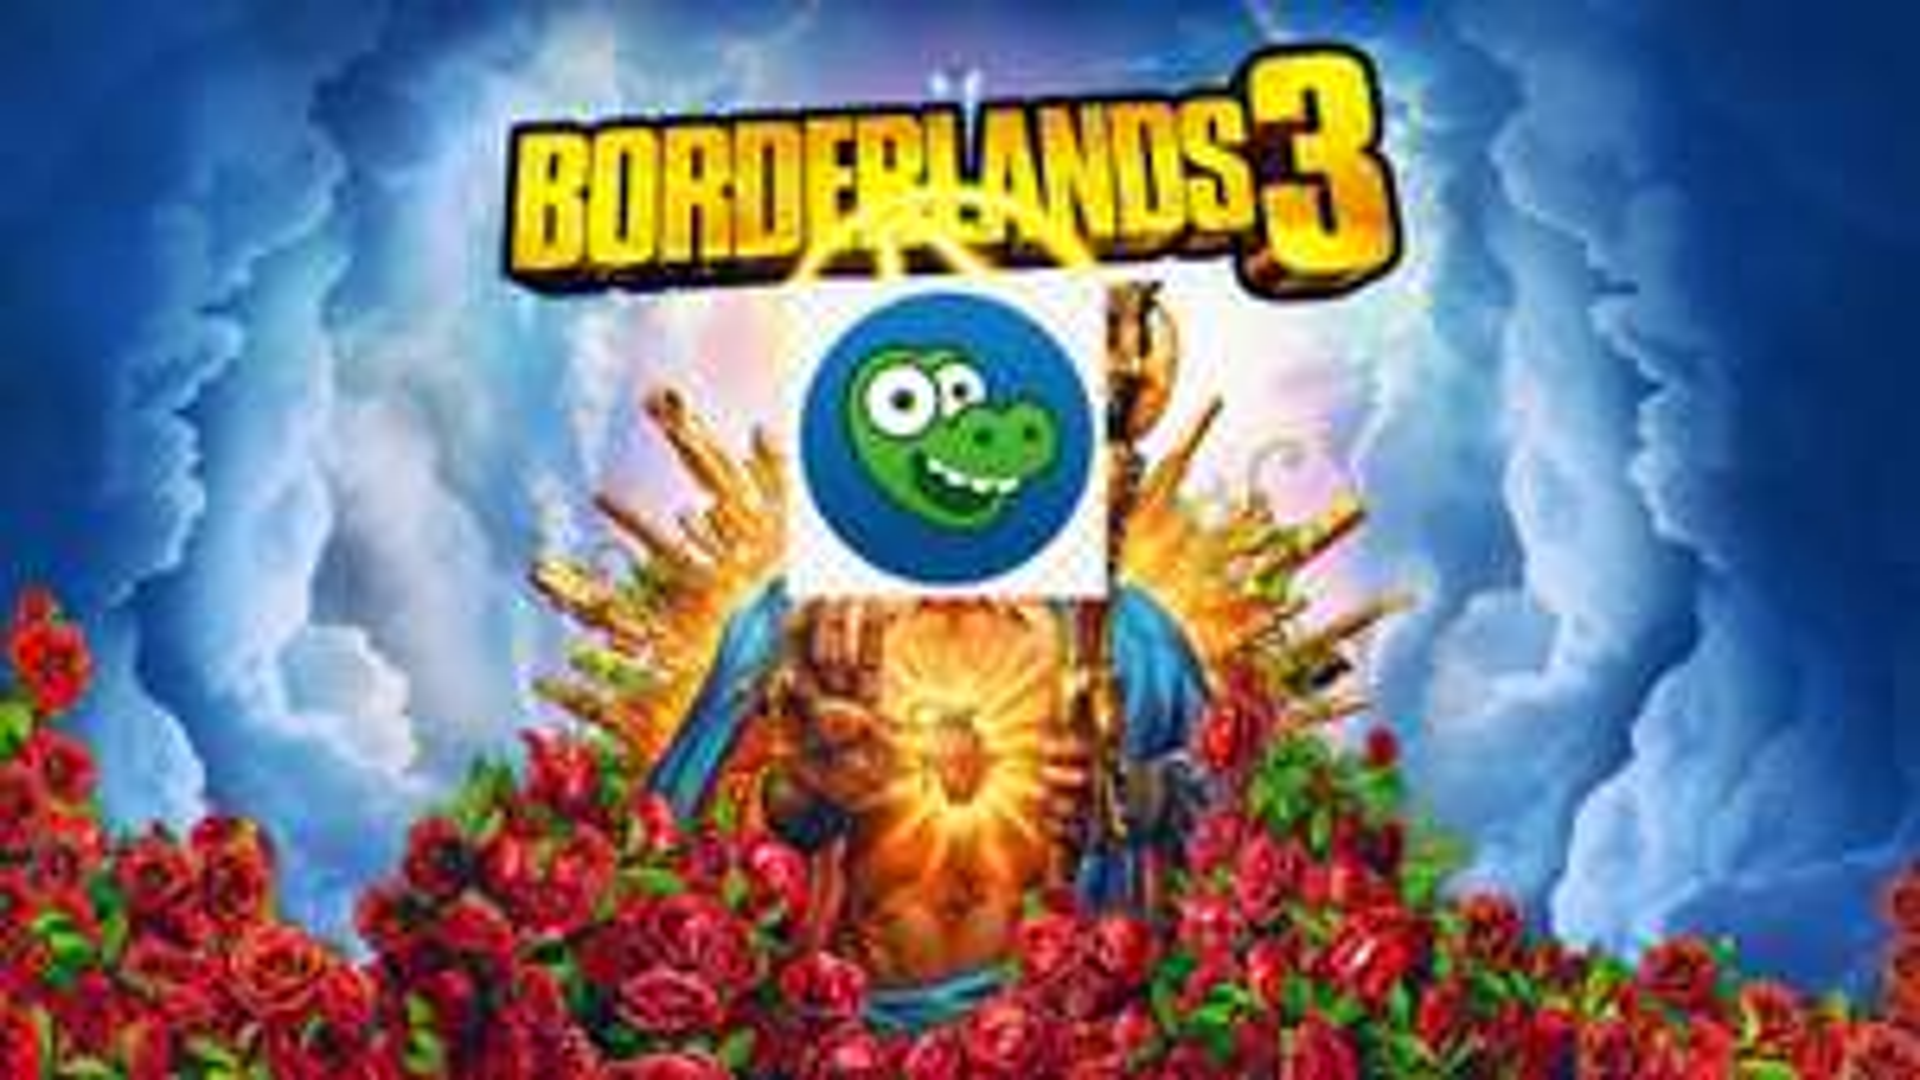 Borderlands 3 - Sammelthread: Goldene Schlüssel, diverse Shift Codes